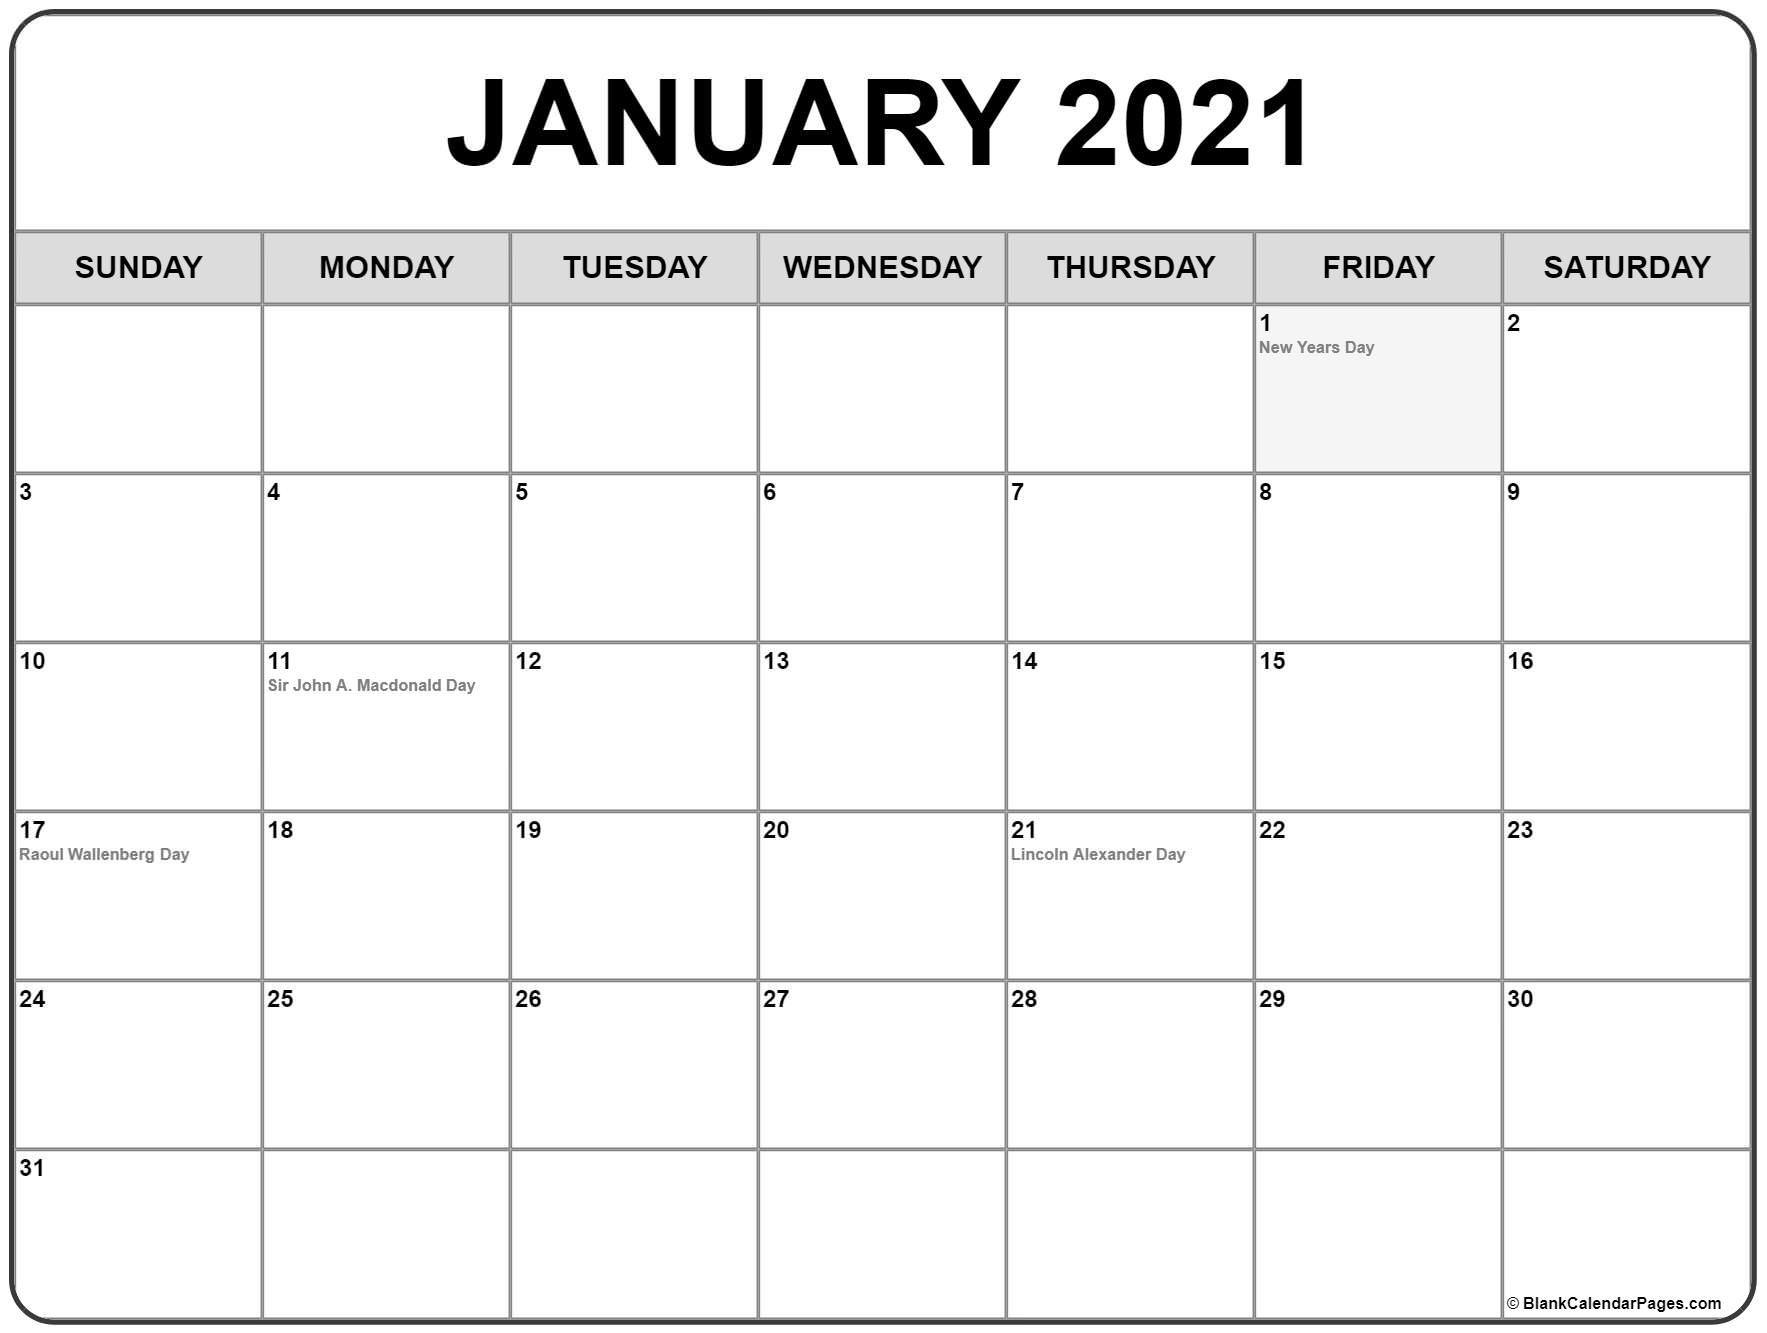 2021 Calendar With Bank Holidays  Example Calendar Printable for 2021 Writable Calendars By Month